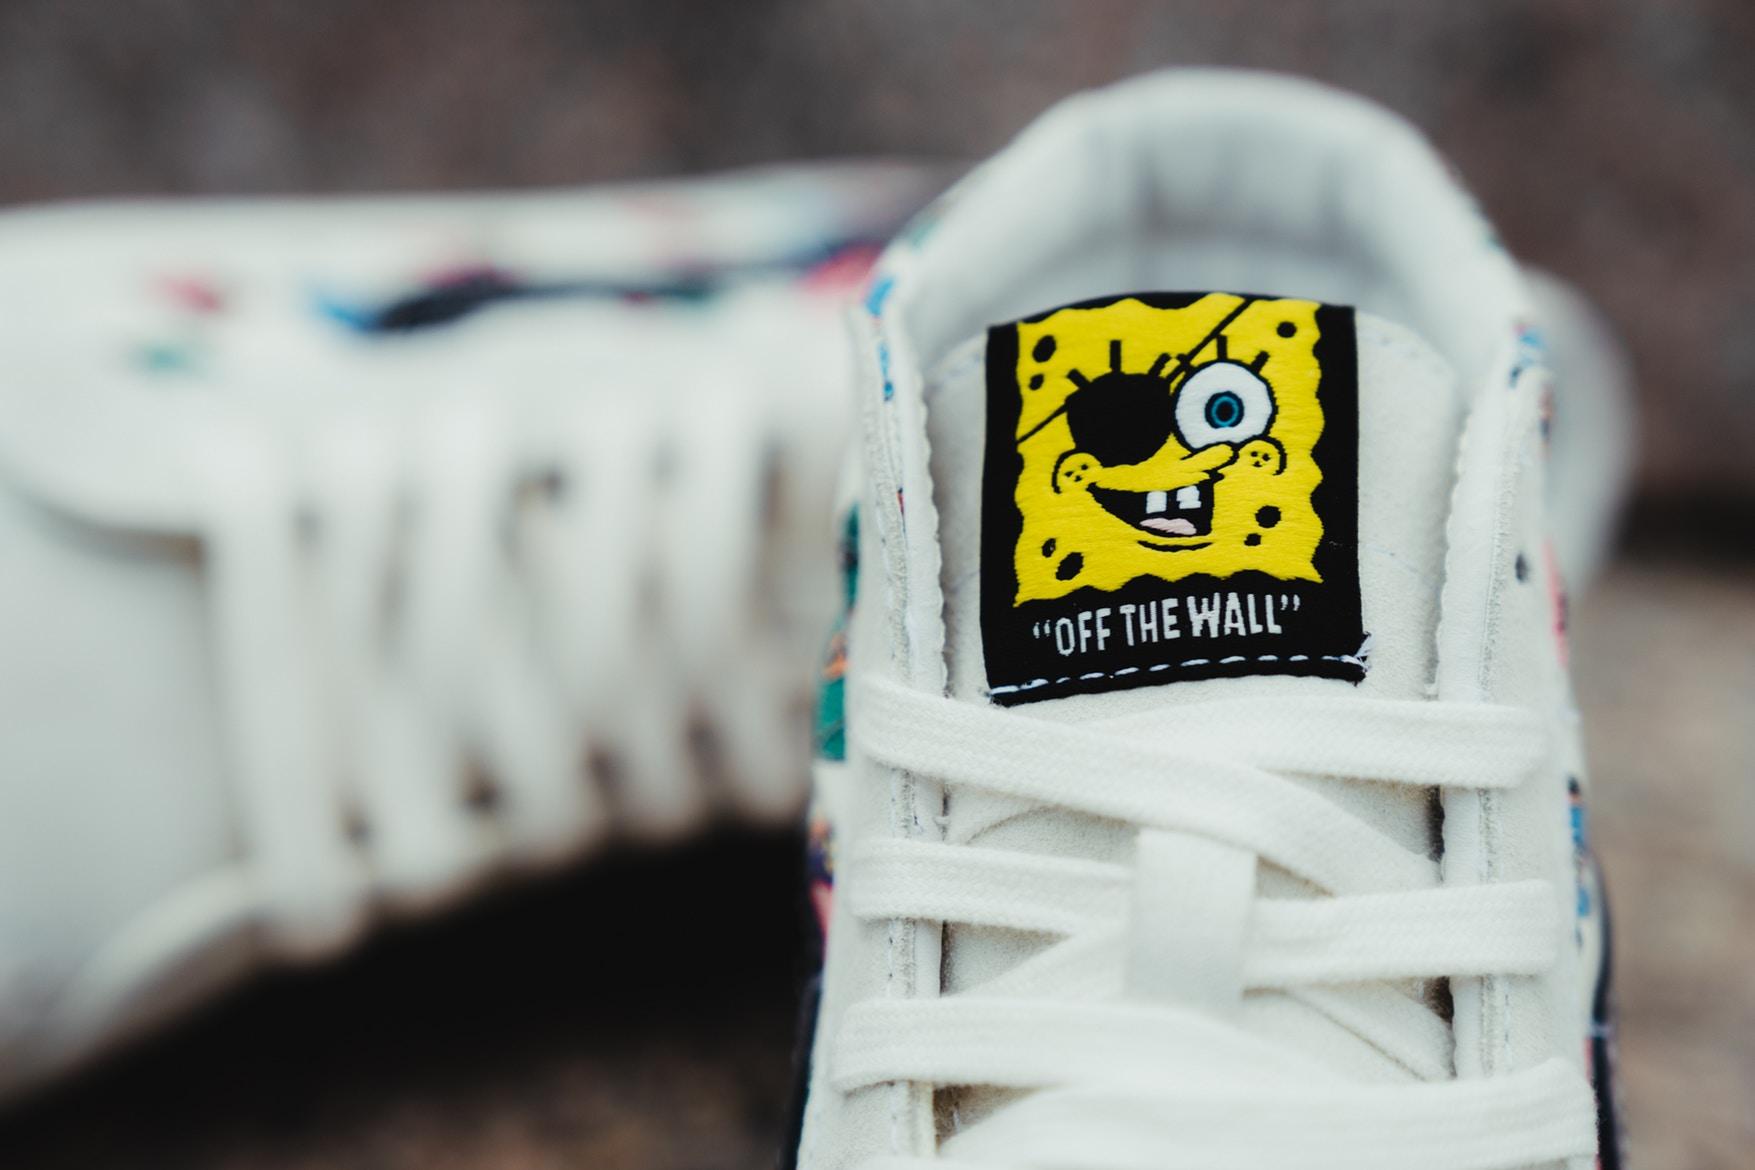 Meet the SpongeBob SquarePants x Vault by Vans Collection